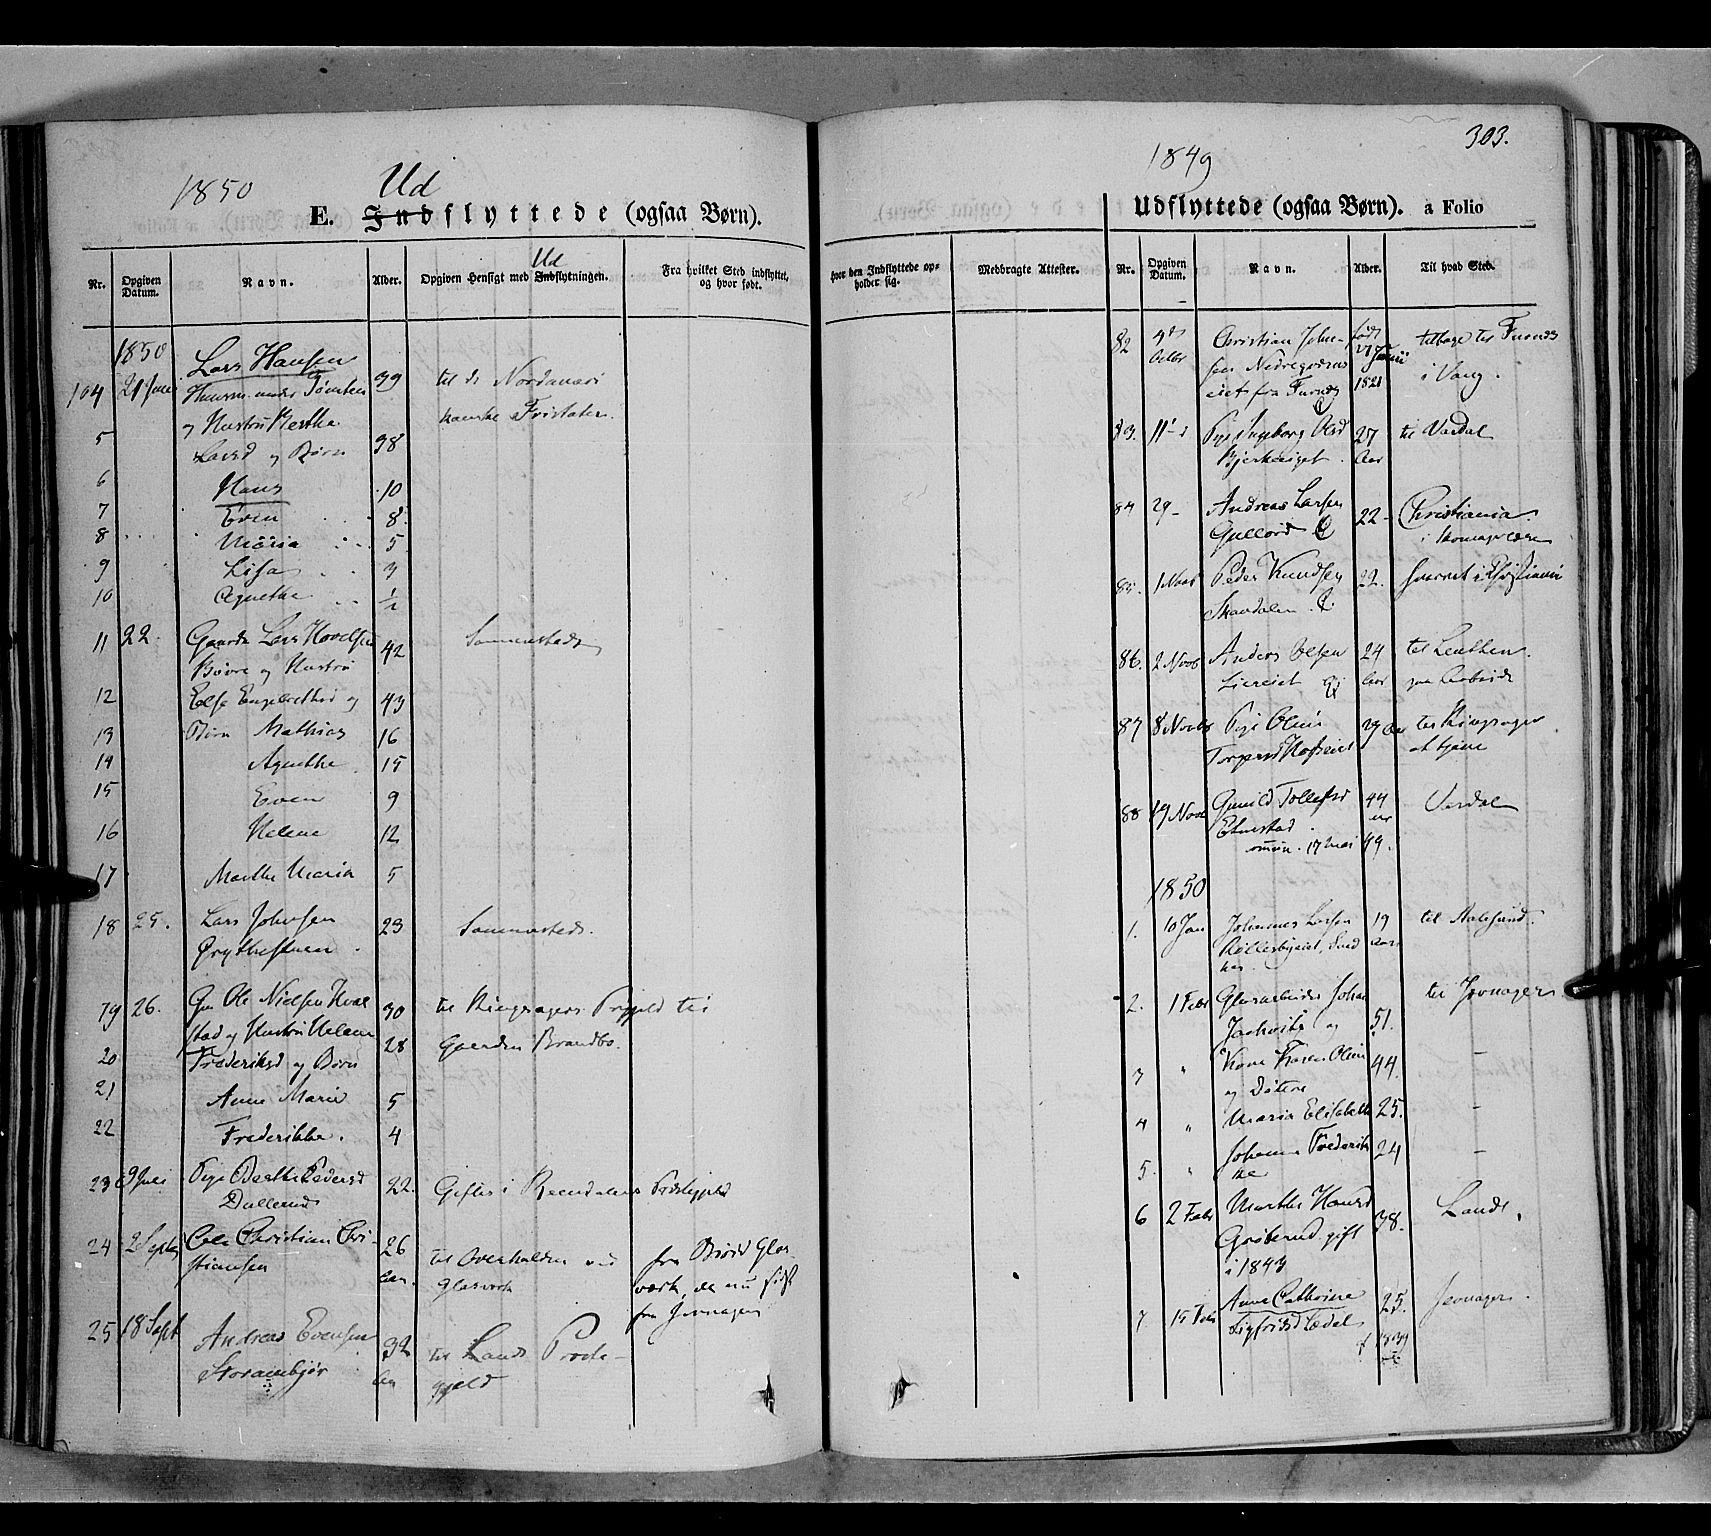 SAH, Biri prestekontor, Ministerialbok nr. 5, 1843-1854, s. 303